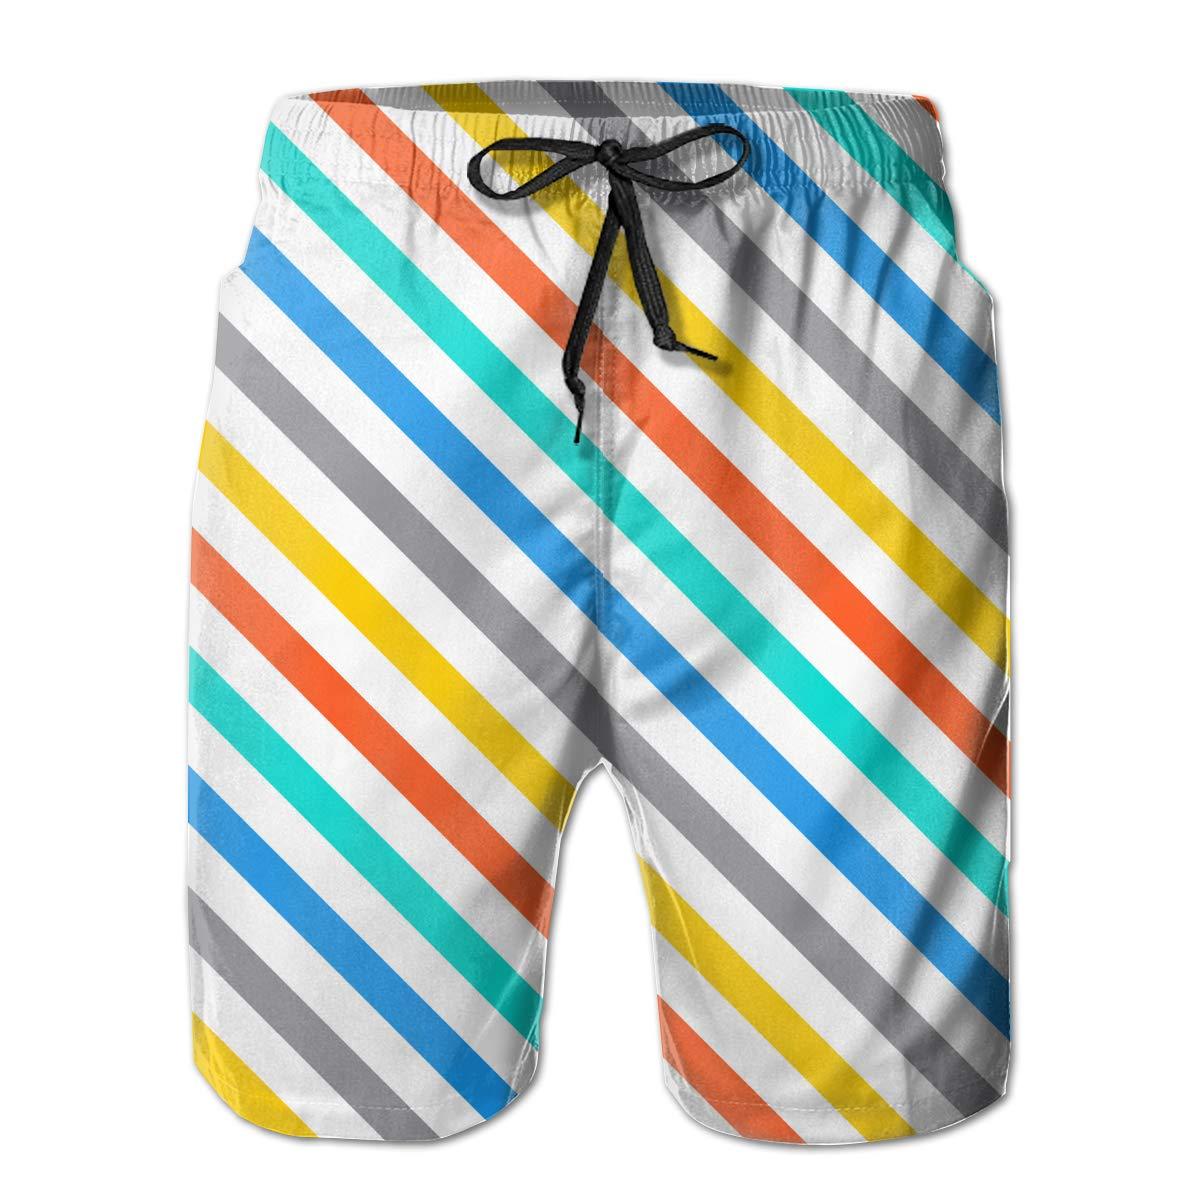 APPCLL Fashion Swim Trunks Mens Board Shorts Diagonal Colorful Stripes Vector Quick Dry Shorts